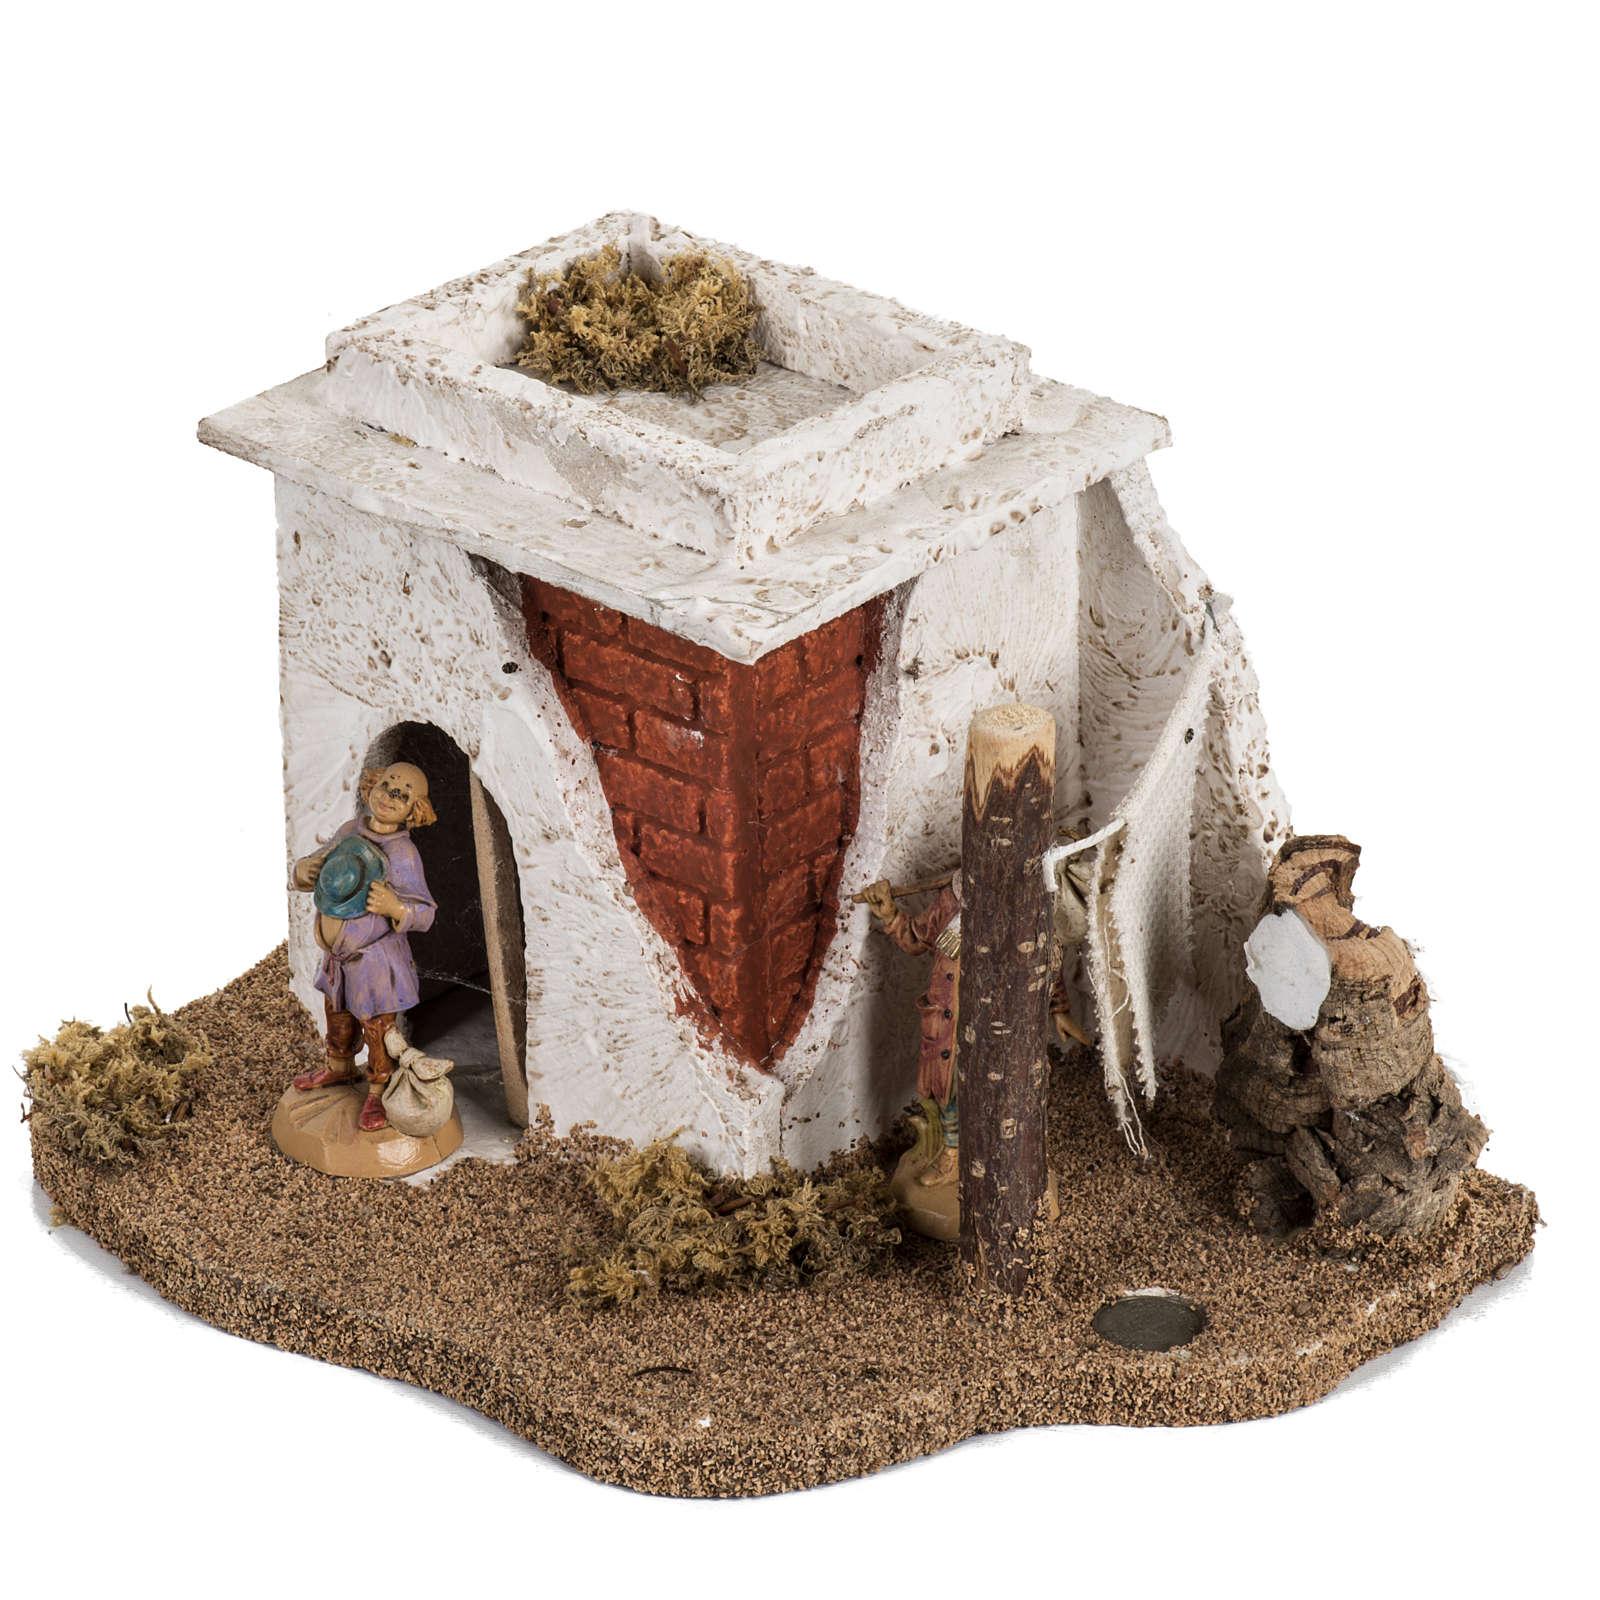 Maison en style arabe crèche Noel Fontanini 6,5 cm 4